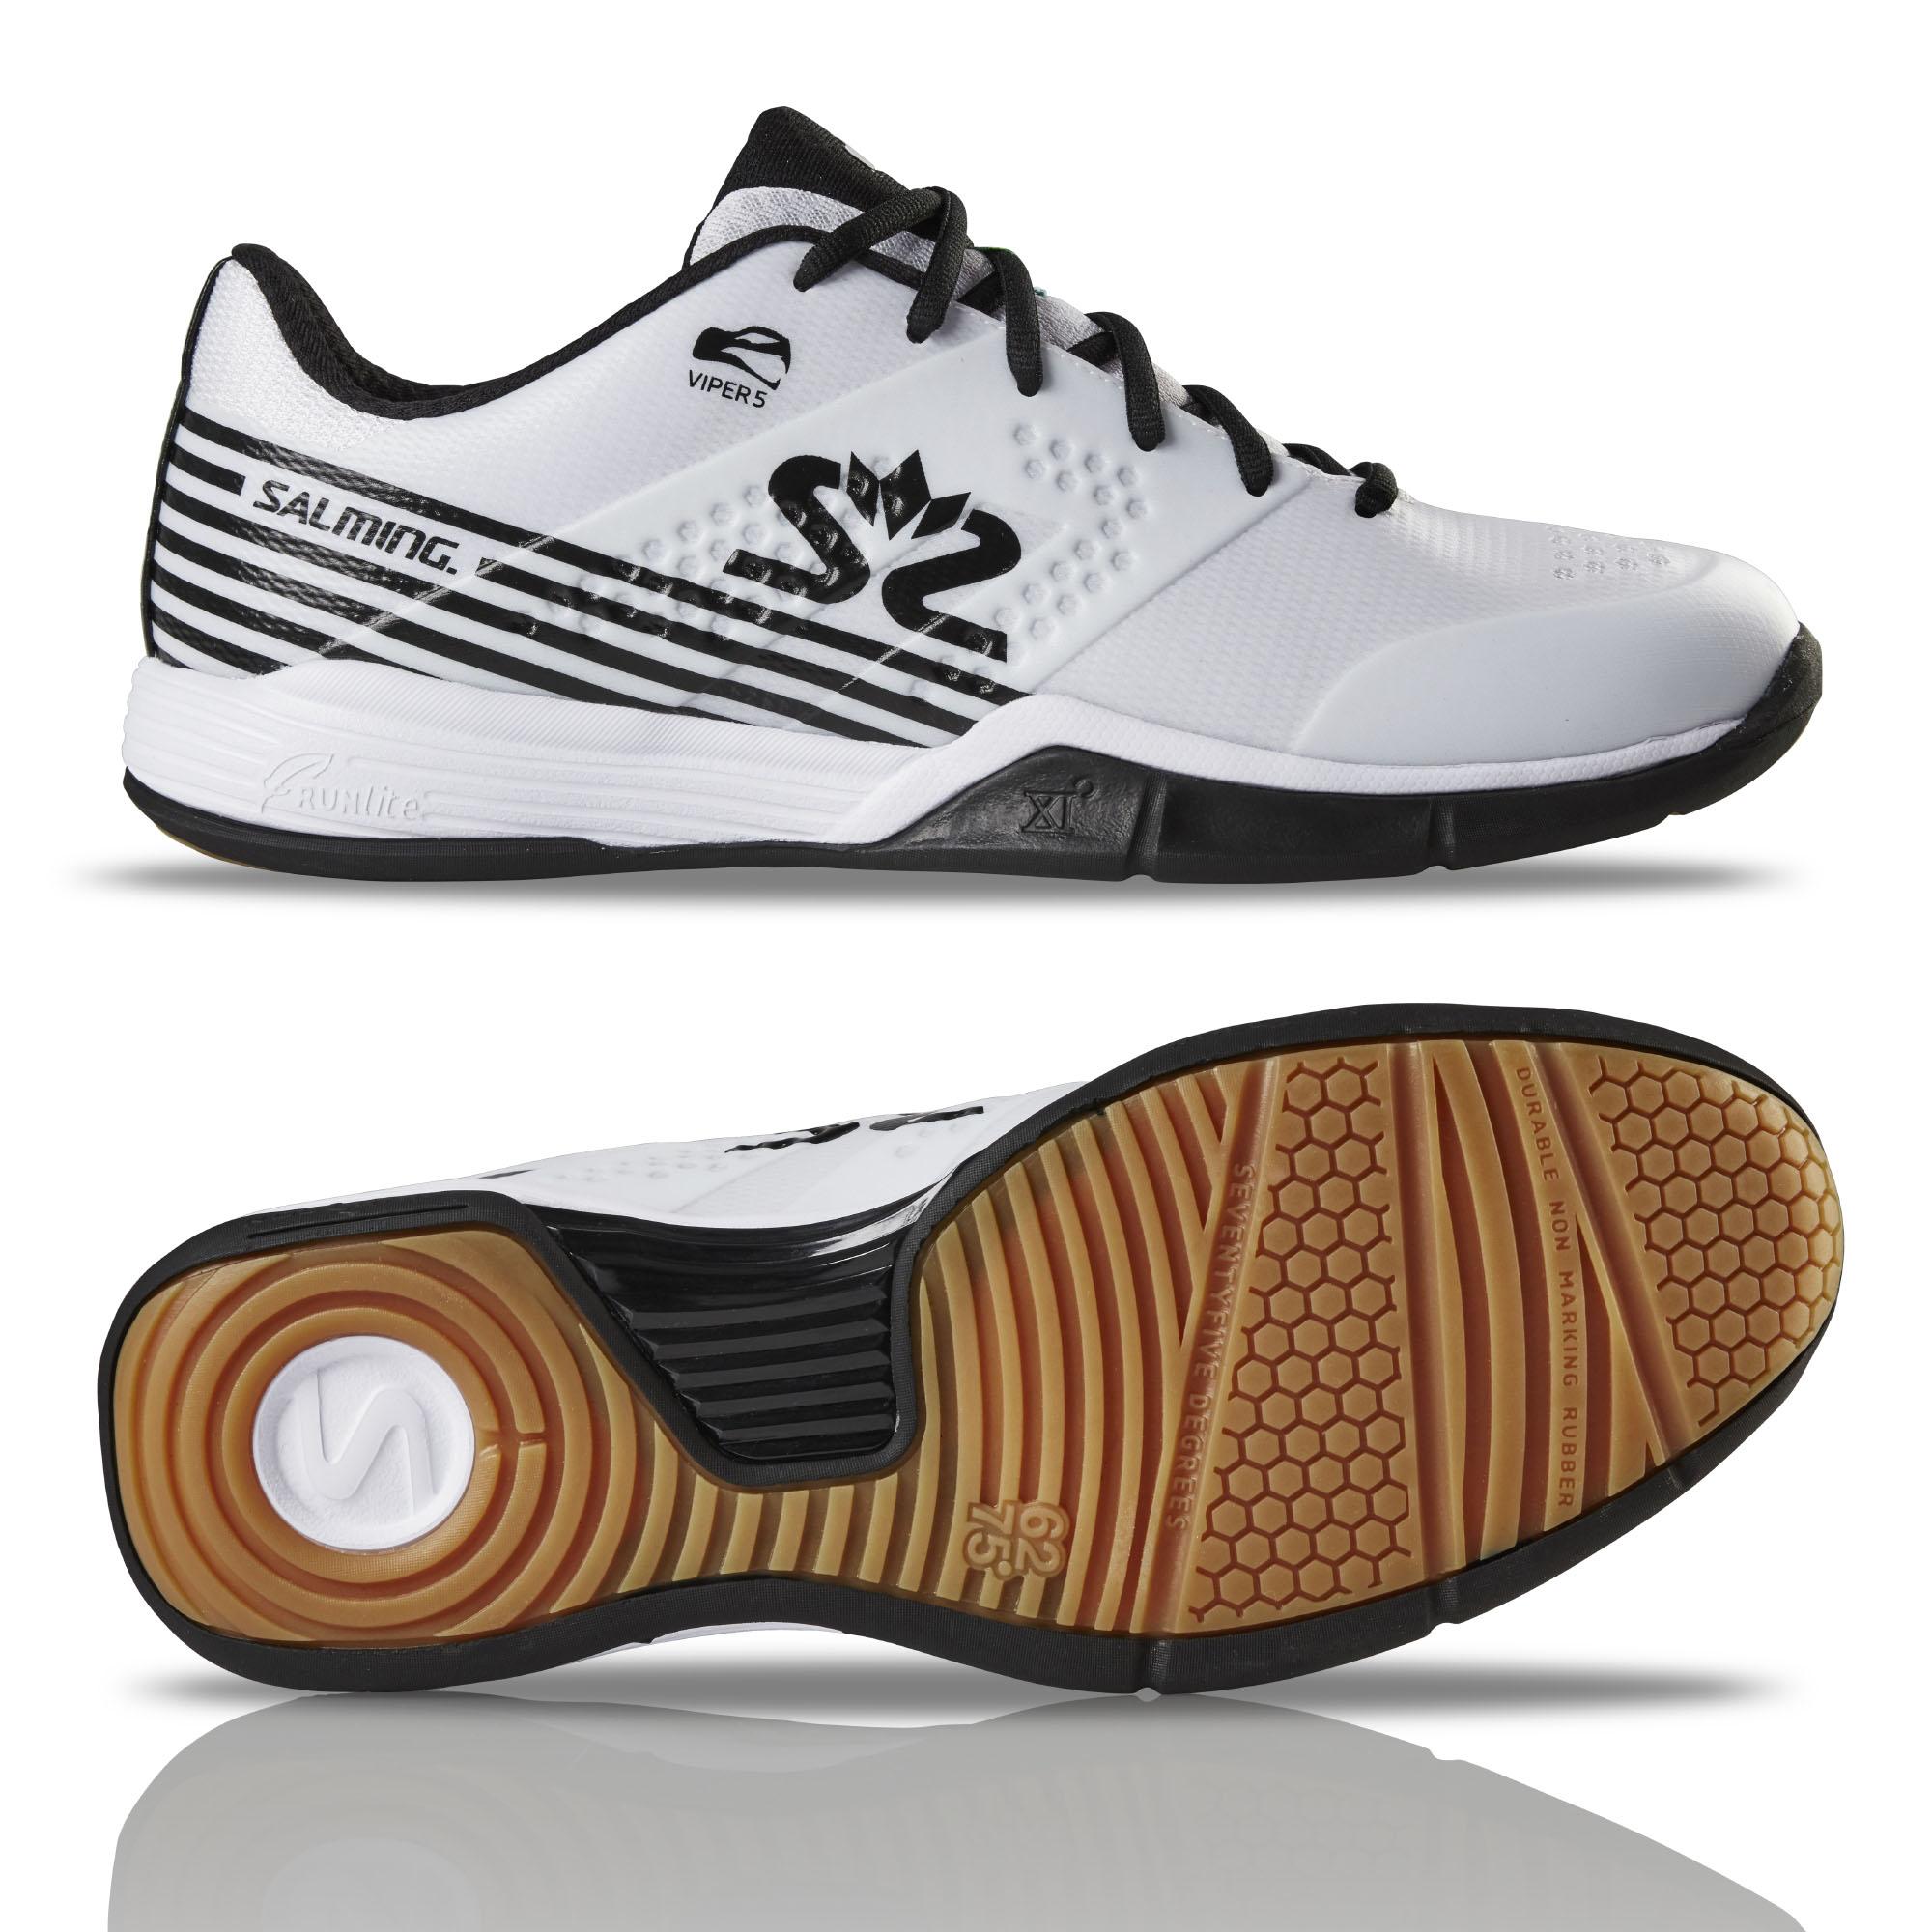 Salming Viper 5 Mens Indoor Court Shoes - White/ Black, 7 UK